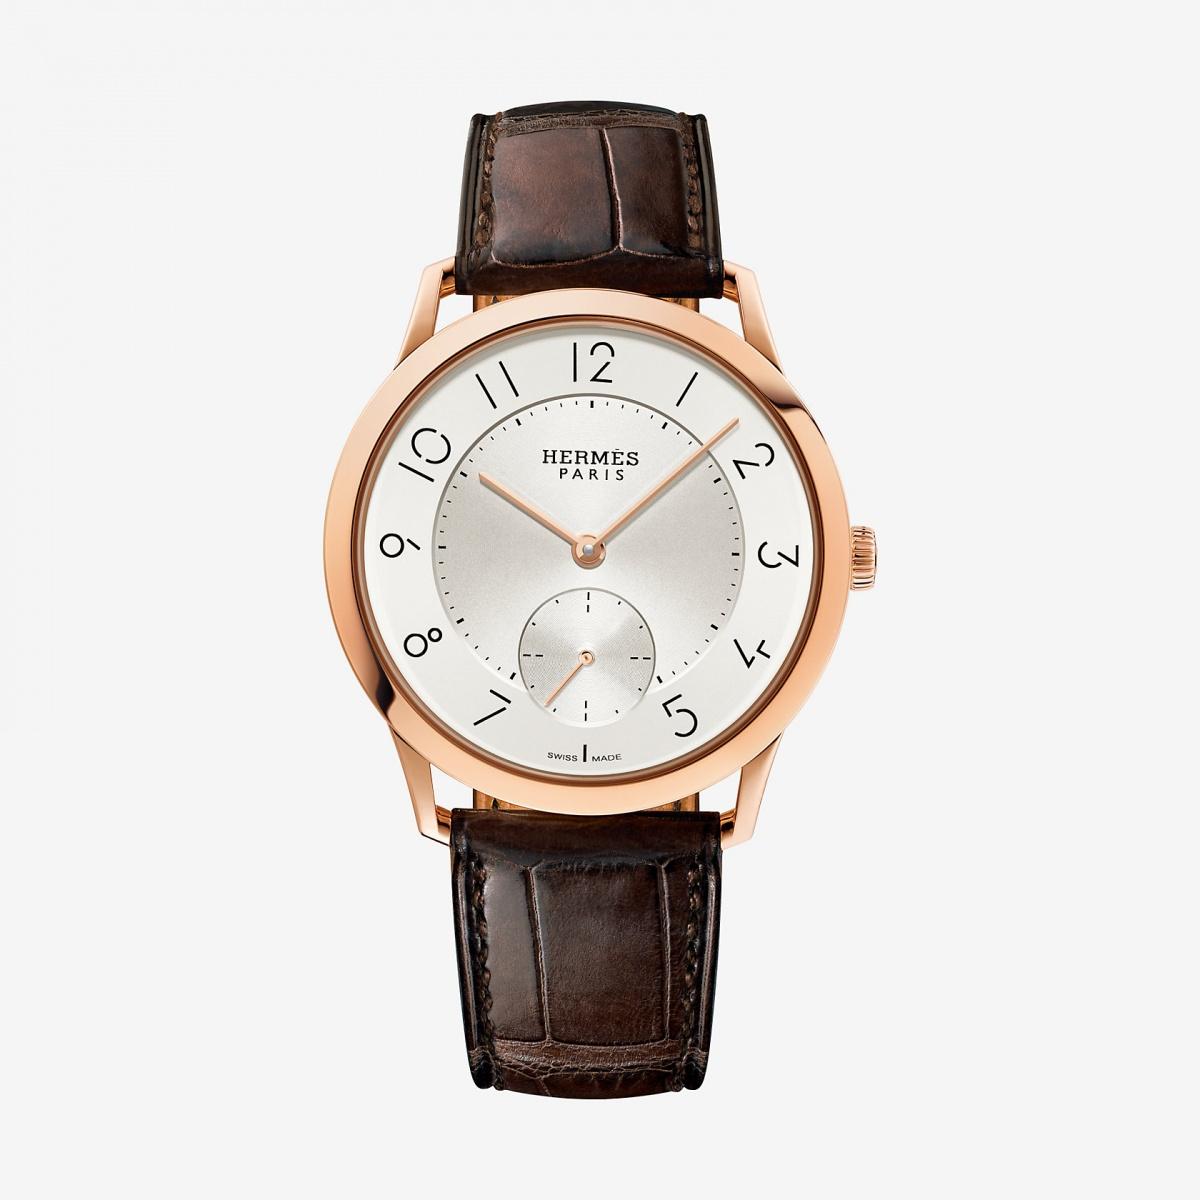 slim-d-hermes-watch-39.5mm--041762WW00-front-1-300-0-1680-1680.jpg